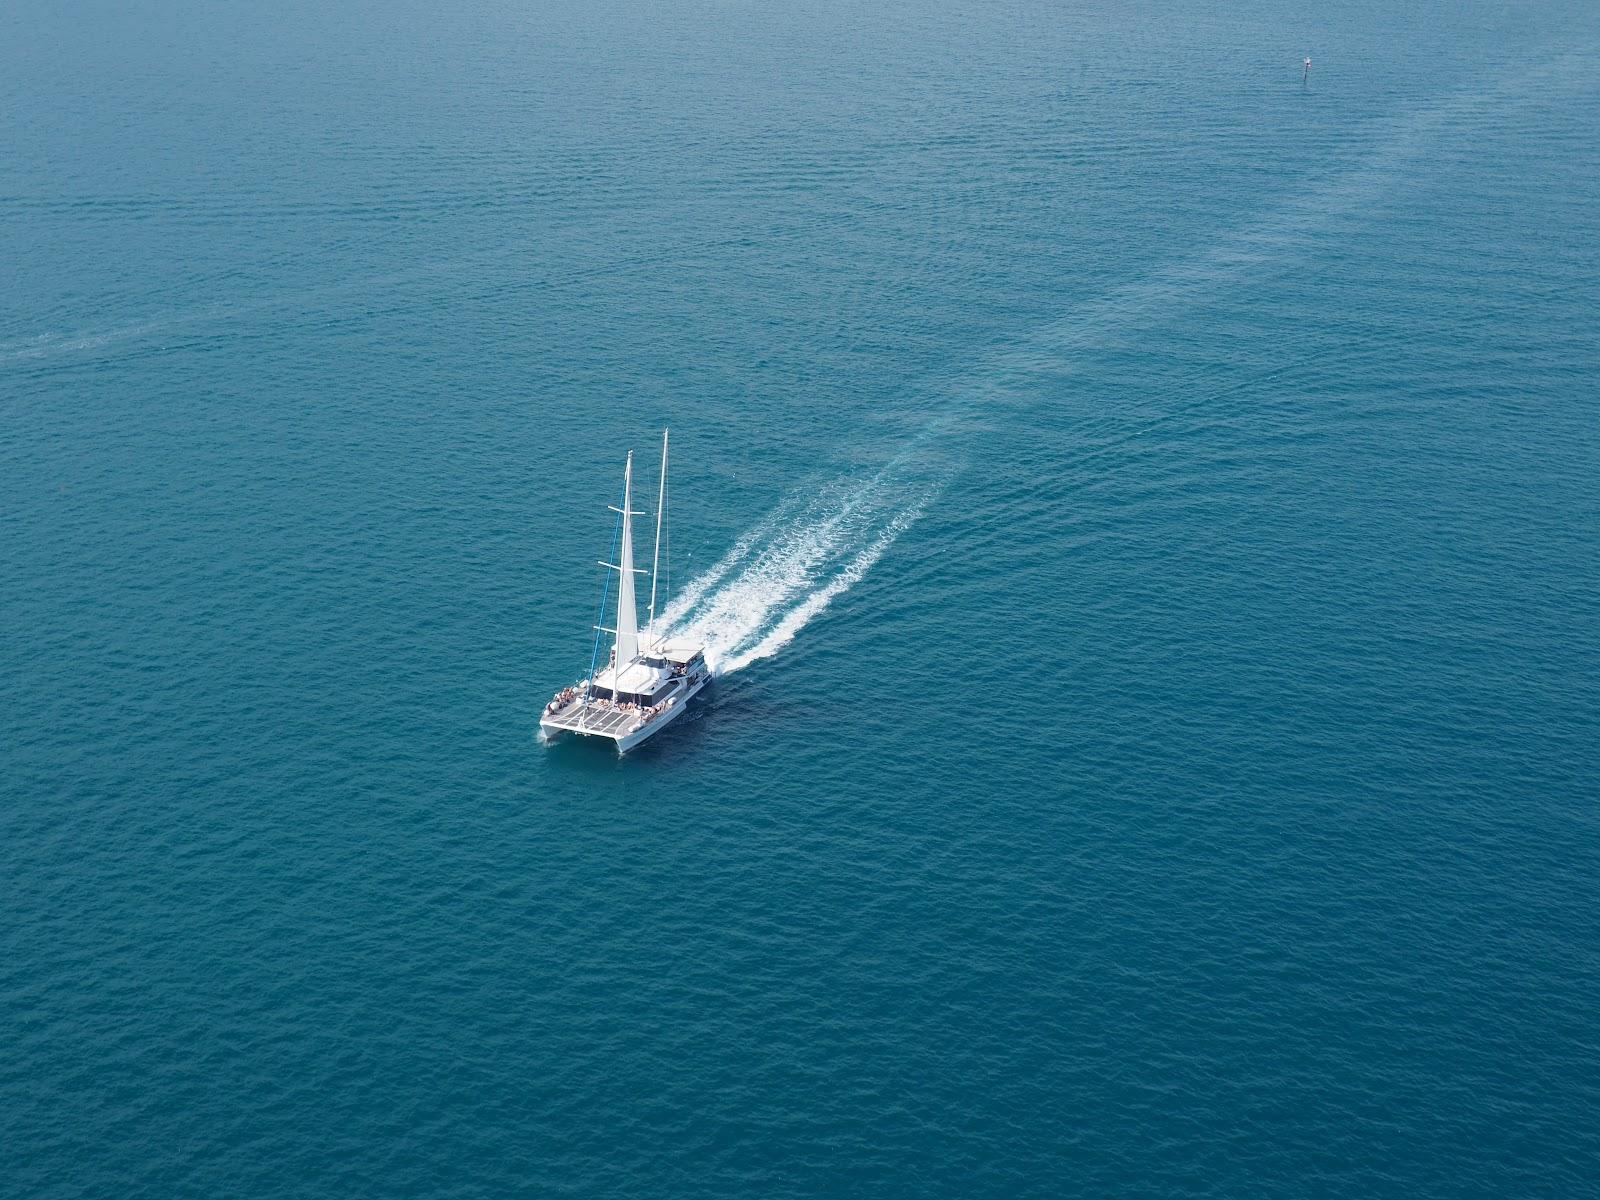 cruising the ocean